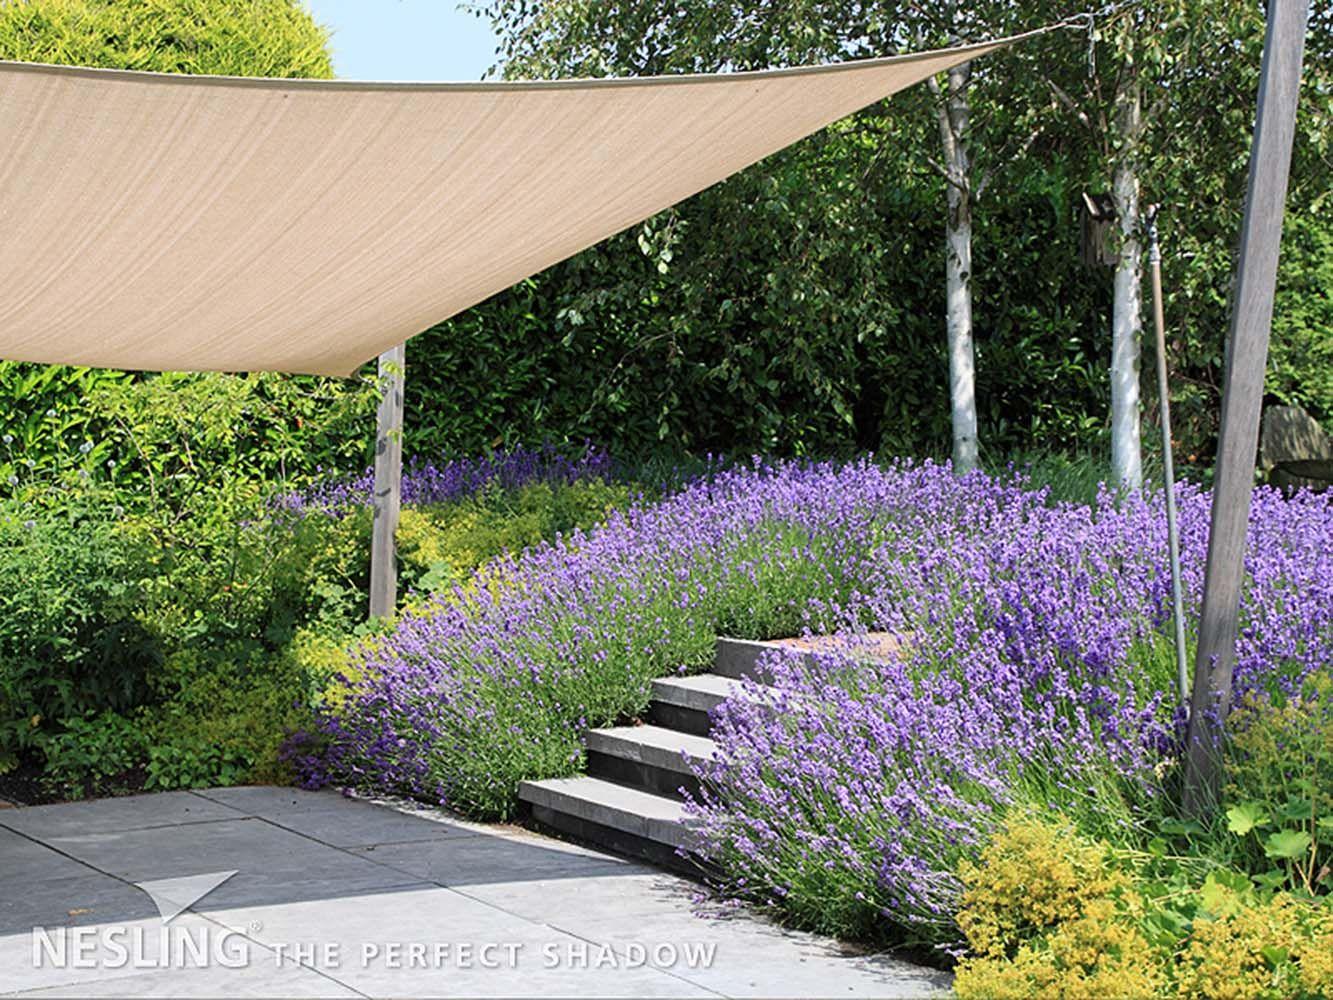 voile d 39 ombrage carr e coolfit sable 5 x 5 m voile d. Black Bedroom Furniture Sets. Home Design Ideas